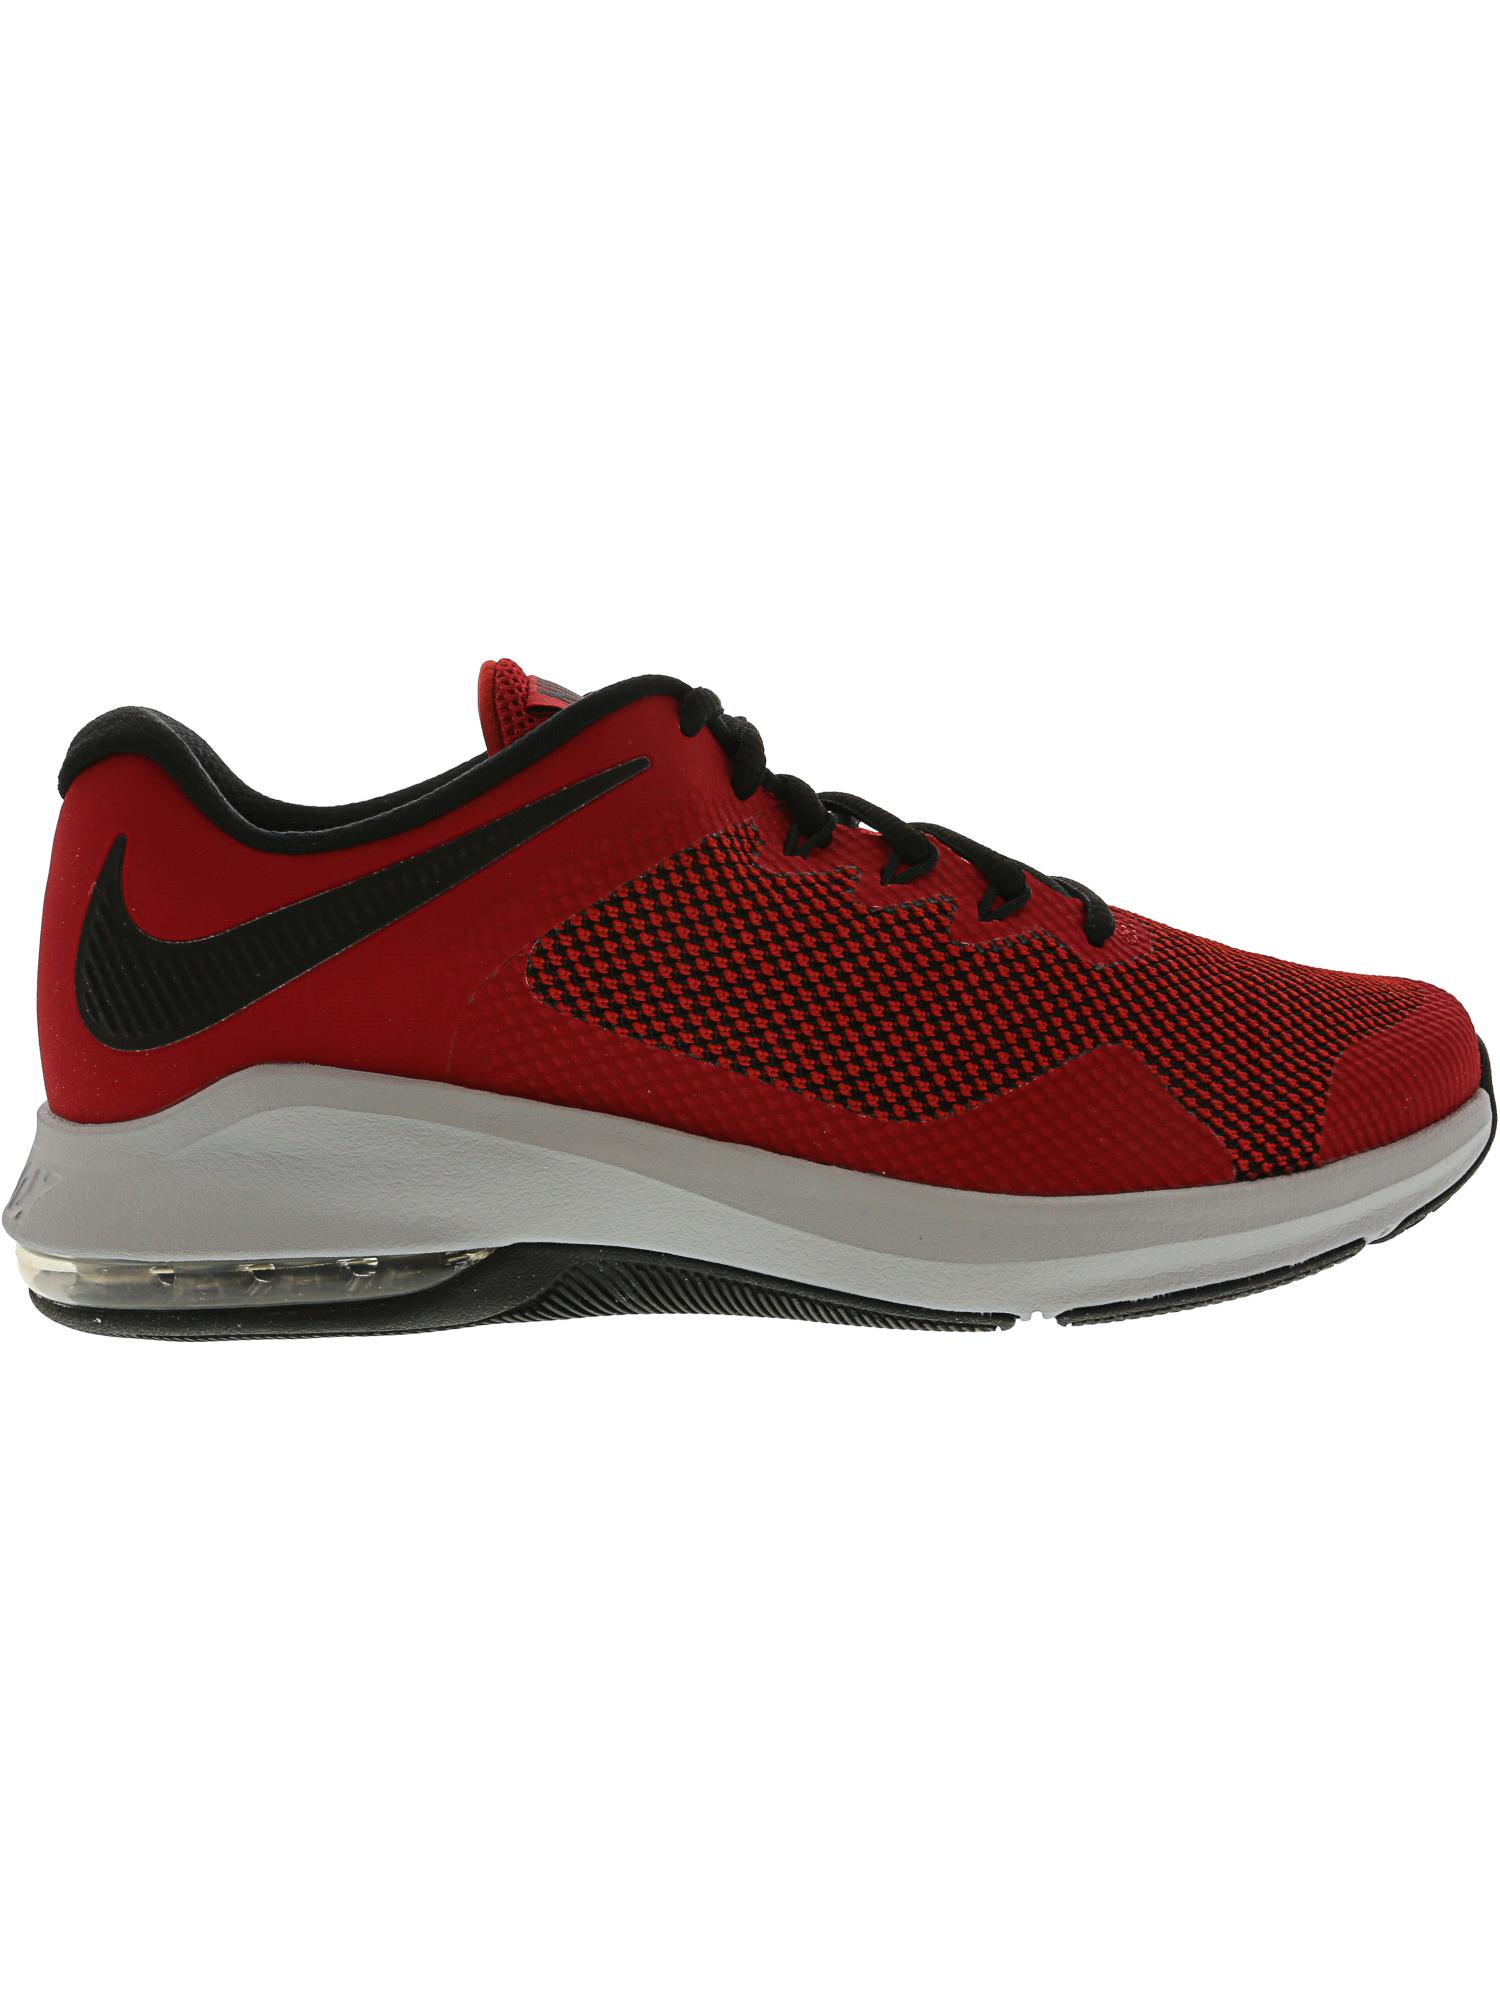 540e8d45d96e Nike Men s Air Max Alpha Trainer Ankle-High Training Shoes